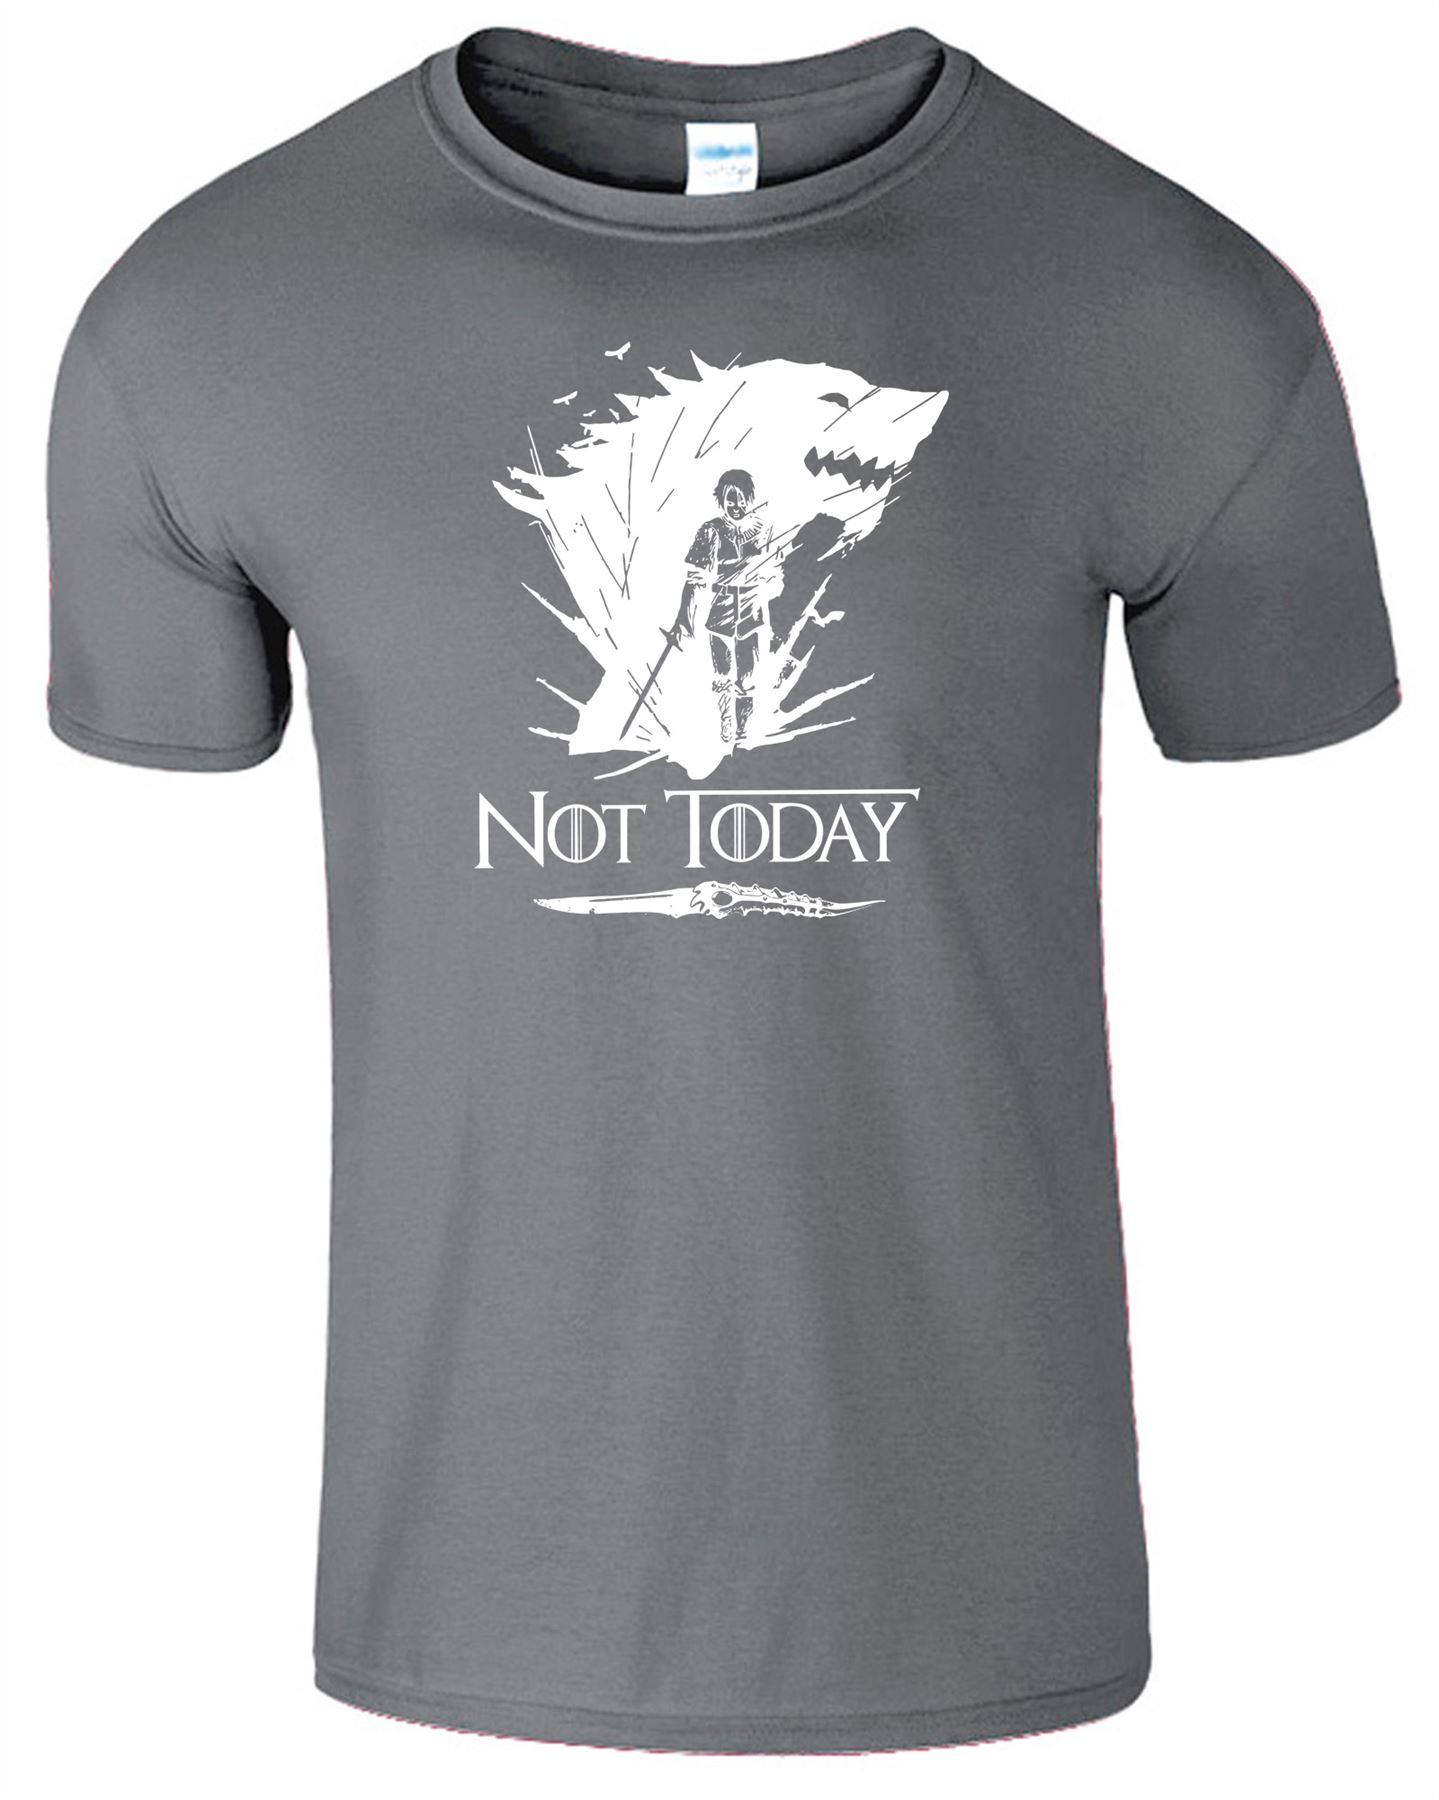 Arya-Stark-Not-Today-T-Shirt-Mens-Game-Season-Womens-Shirt-Adults-Unisex-Fit Indexbild 4